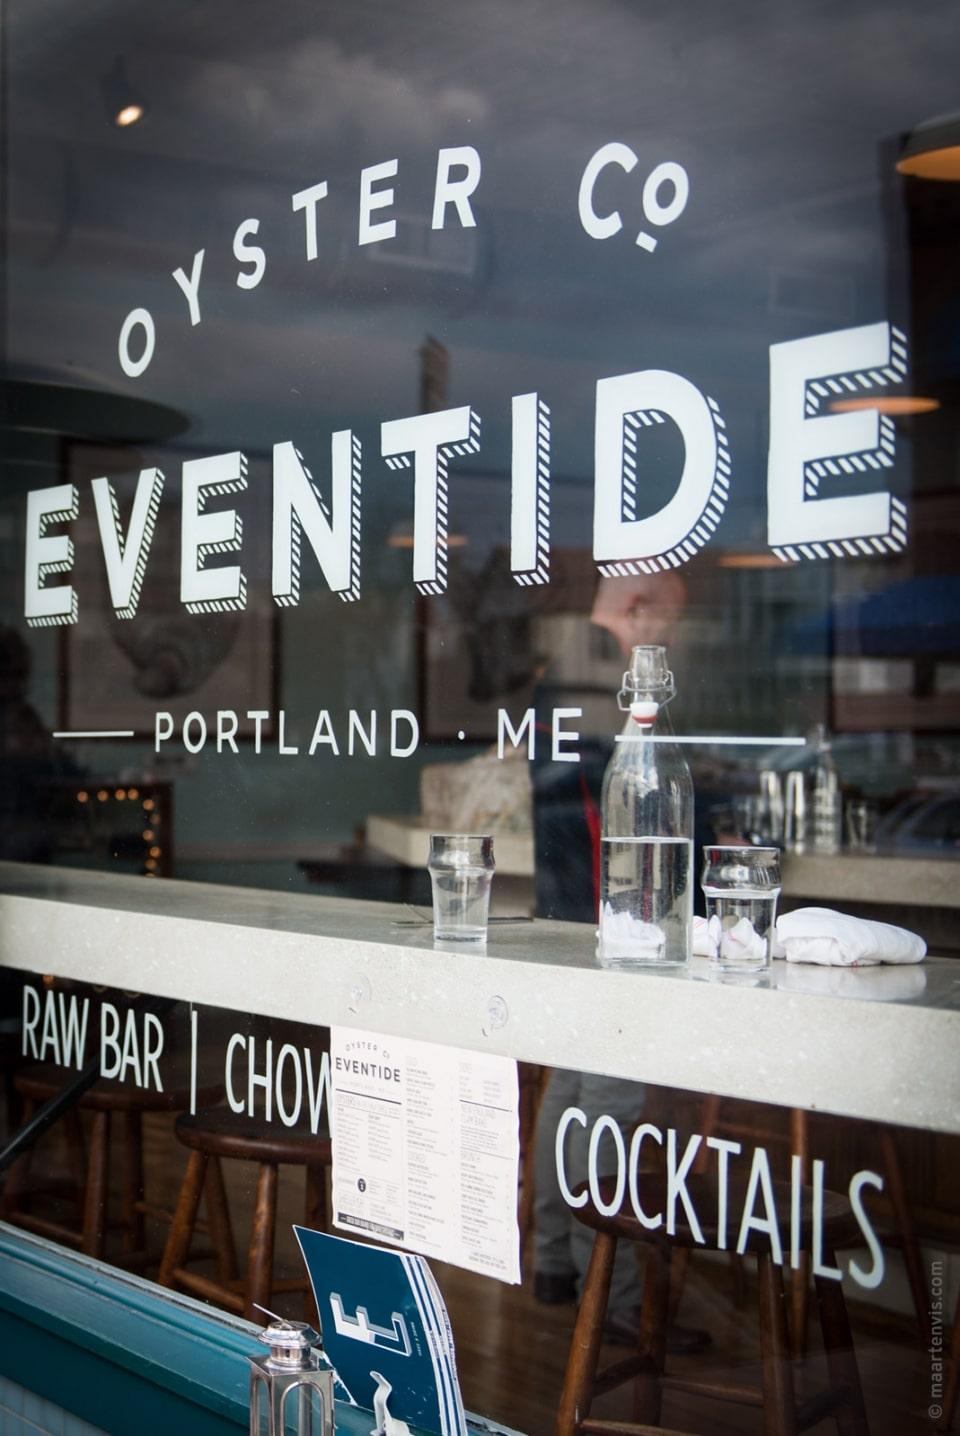 20131027 5391 960x1436 - Portland Restaurants - Our Top Three